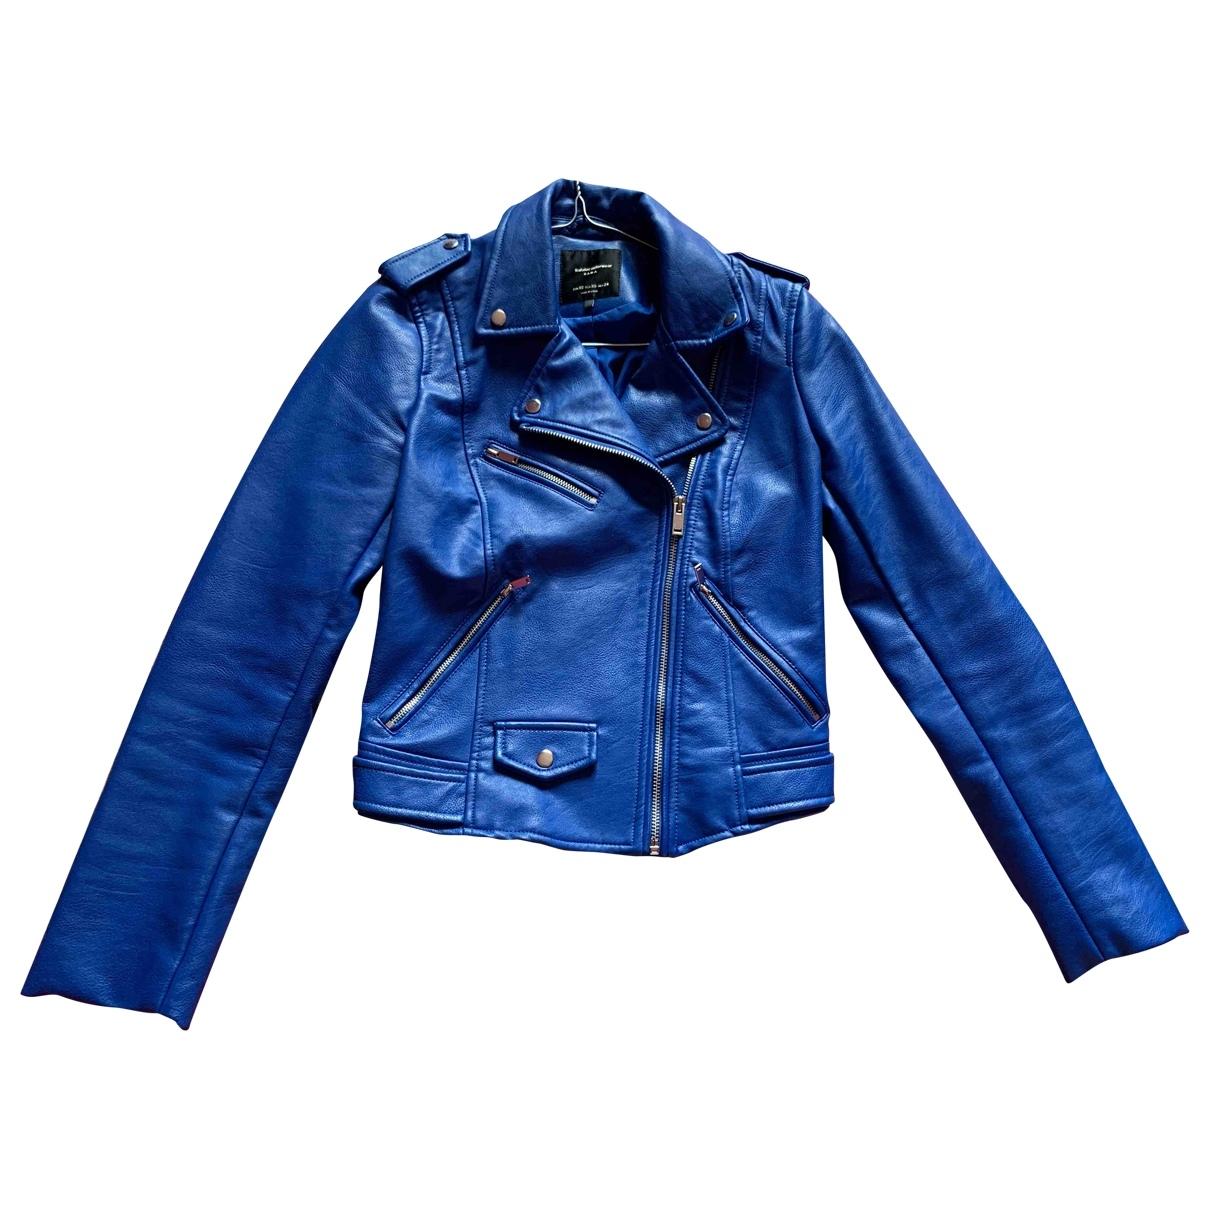 Zara \N Lederjacke in  Blau Polyester